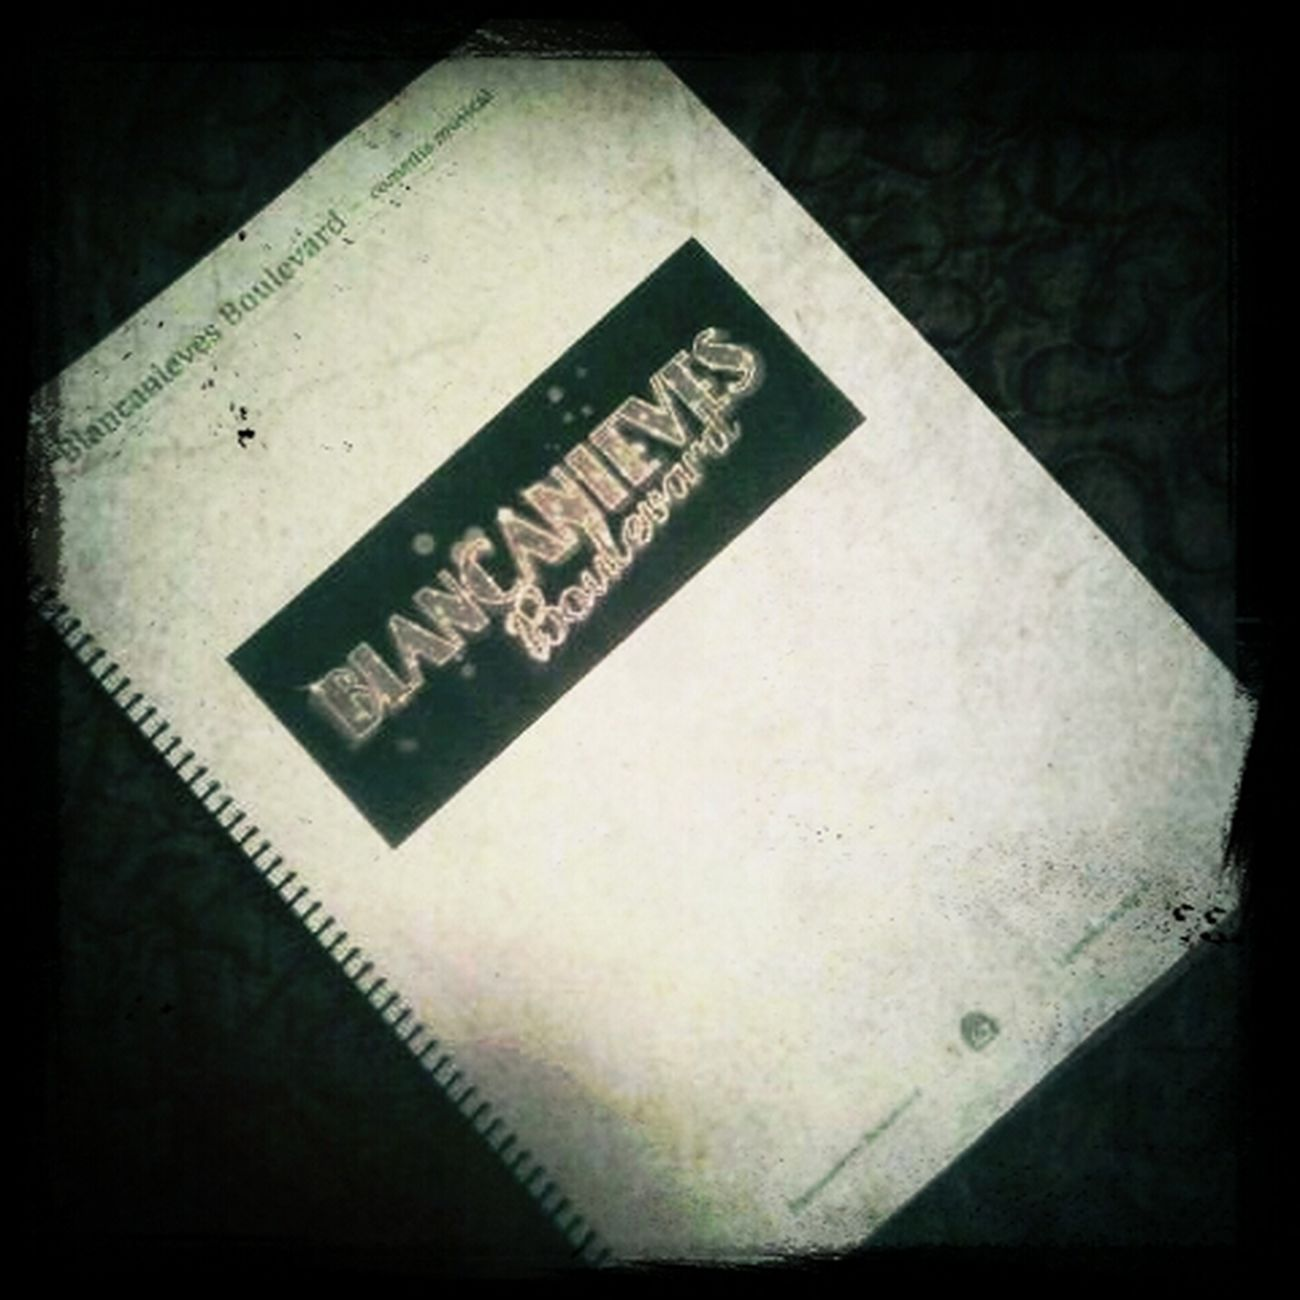 Mi primer libreto! q emocion :P